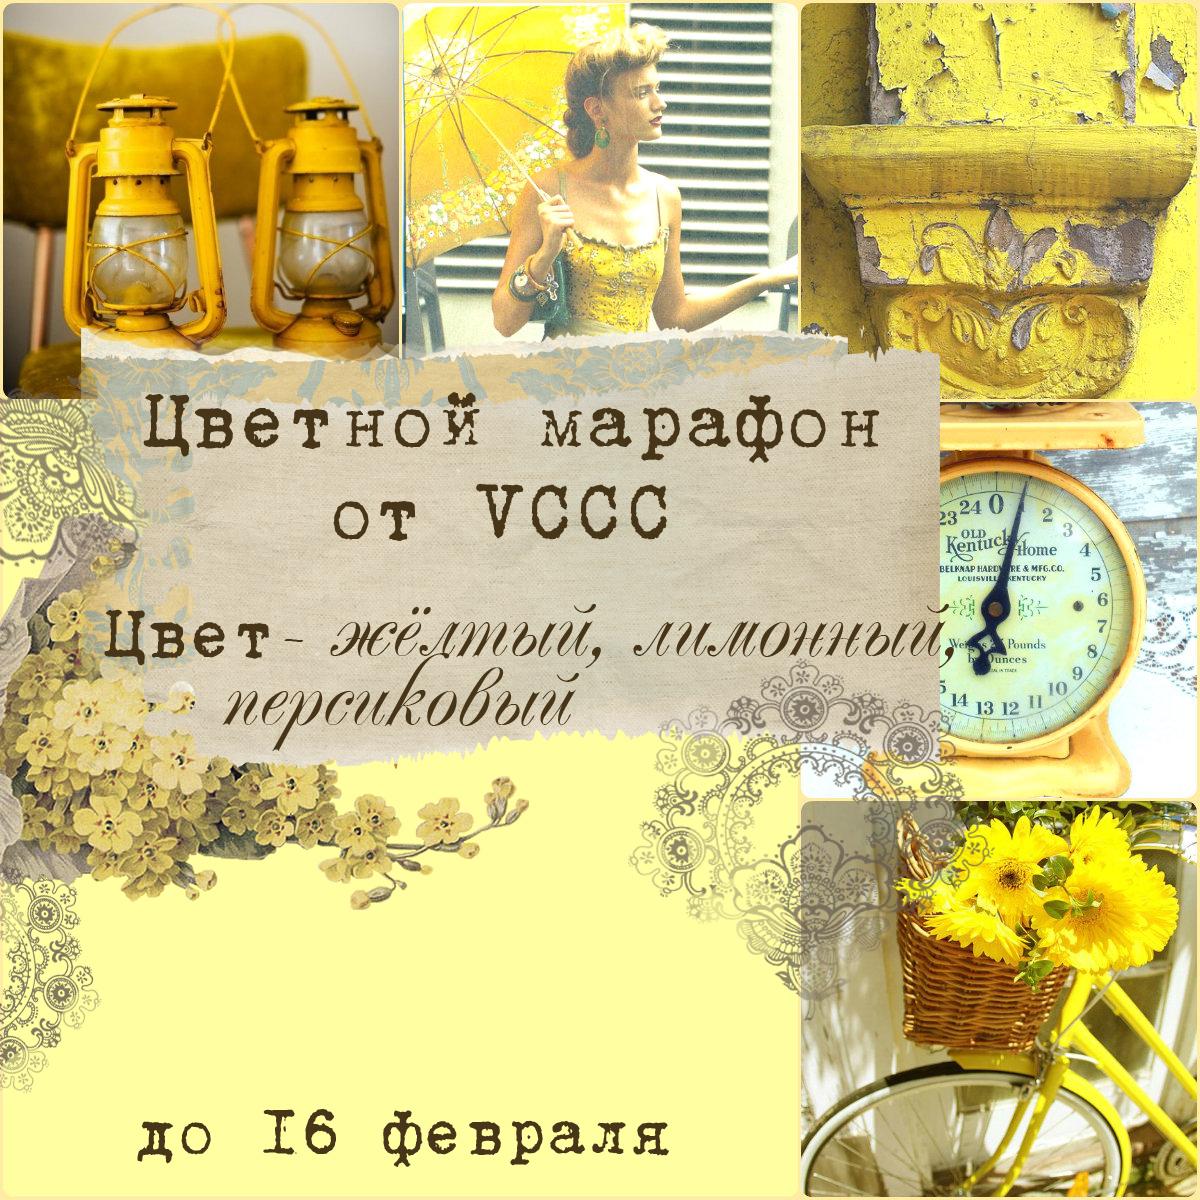 http://vintagecafecard.blogspot.ru/2015/02/2.html